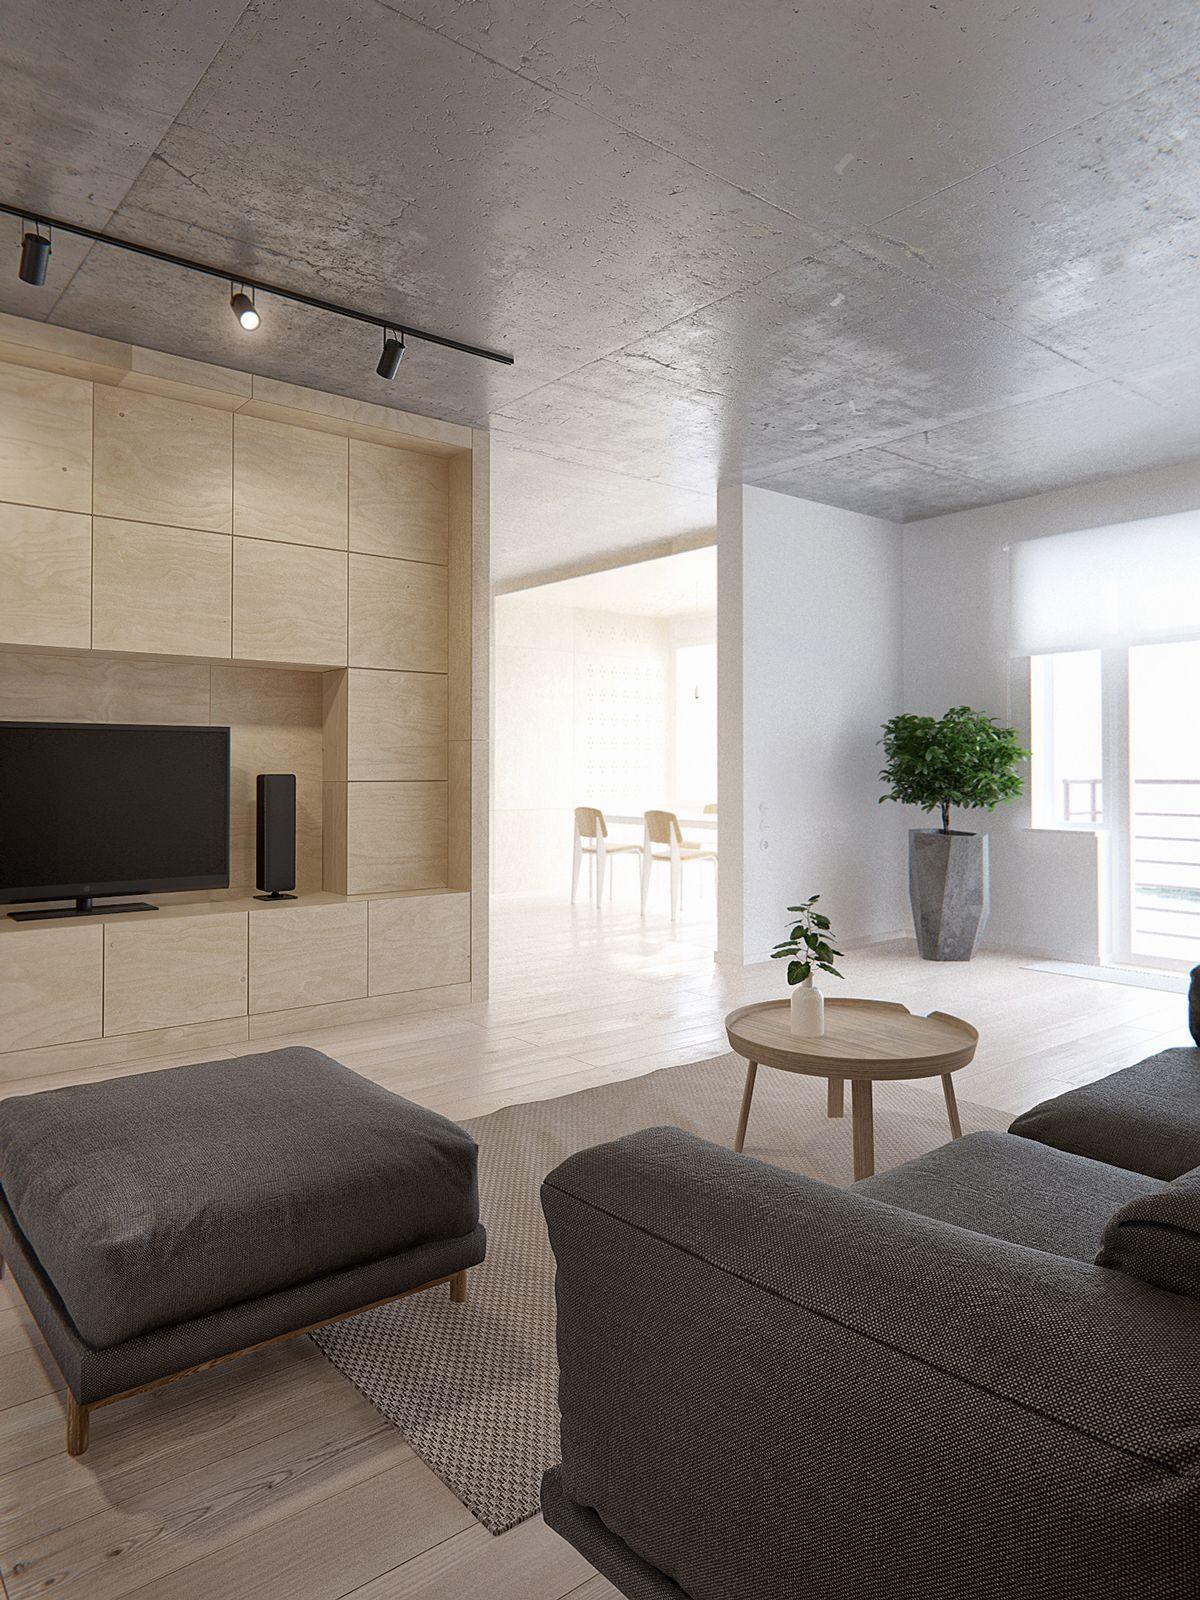 Interior il on behance